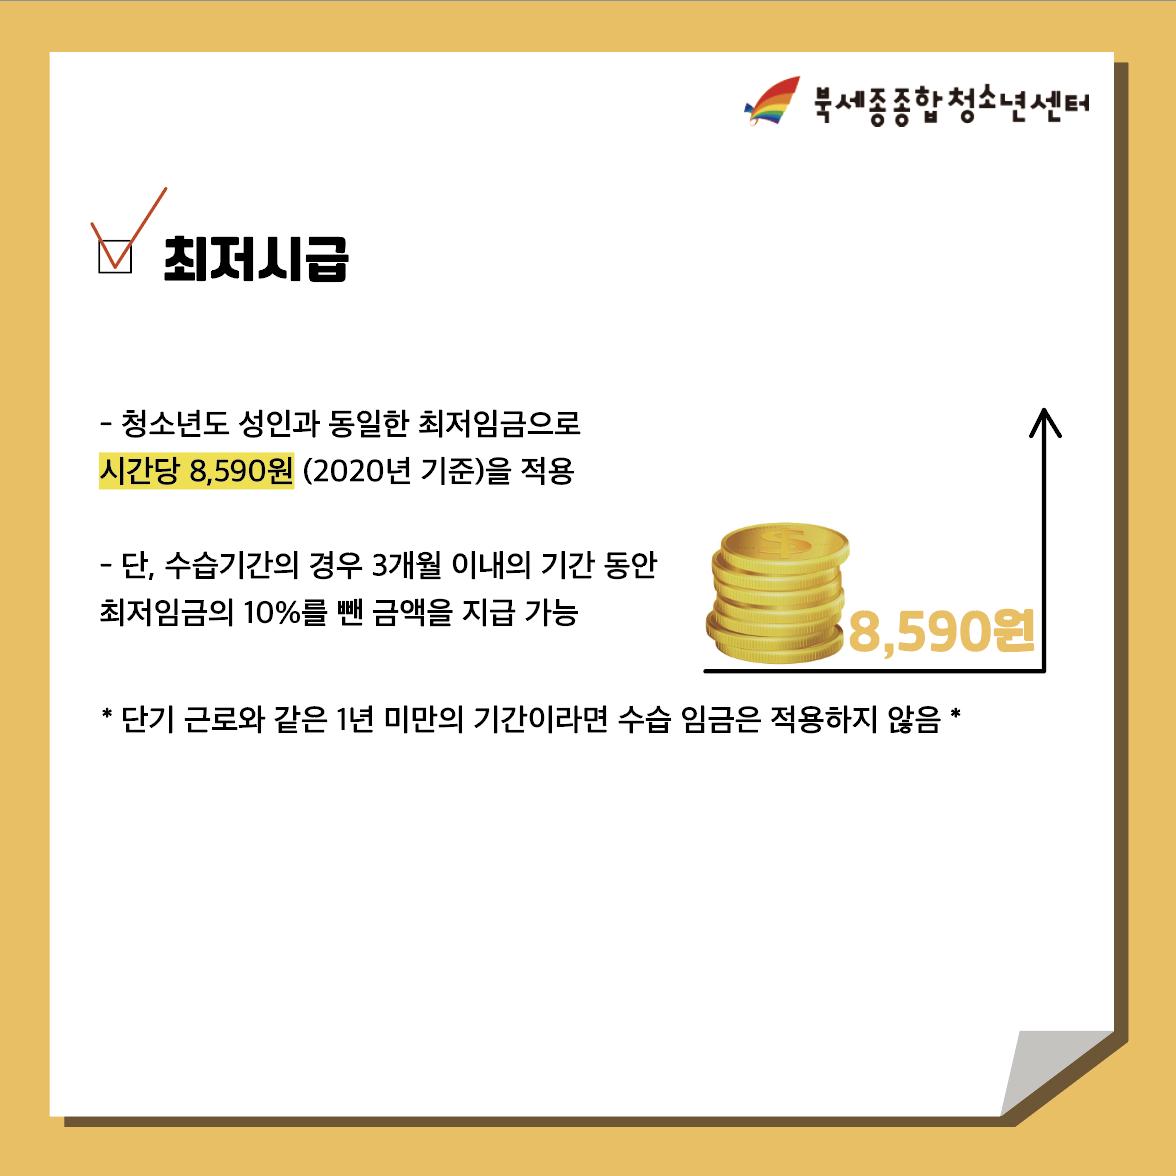 KakaoTalk_20200511_150755064_03.png